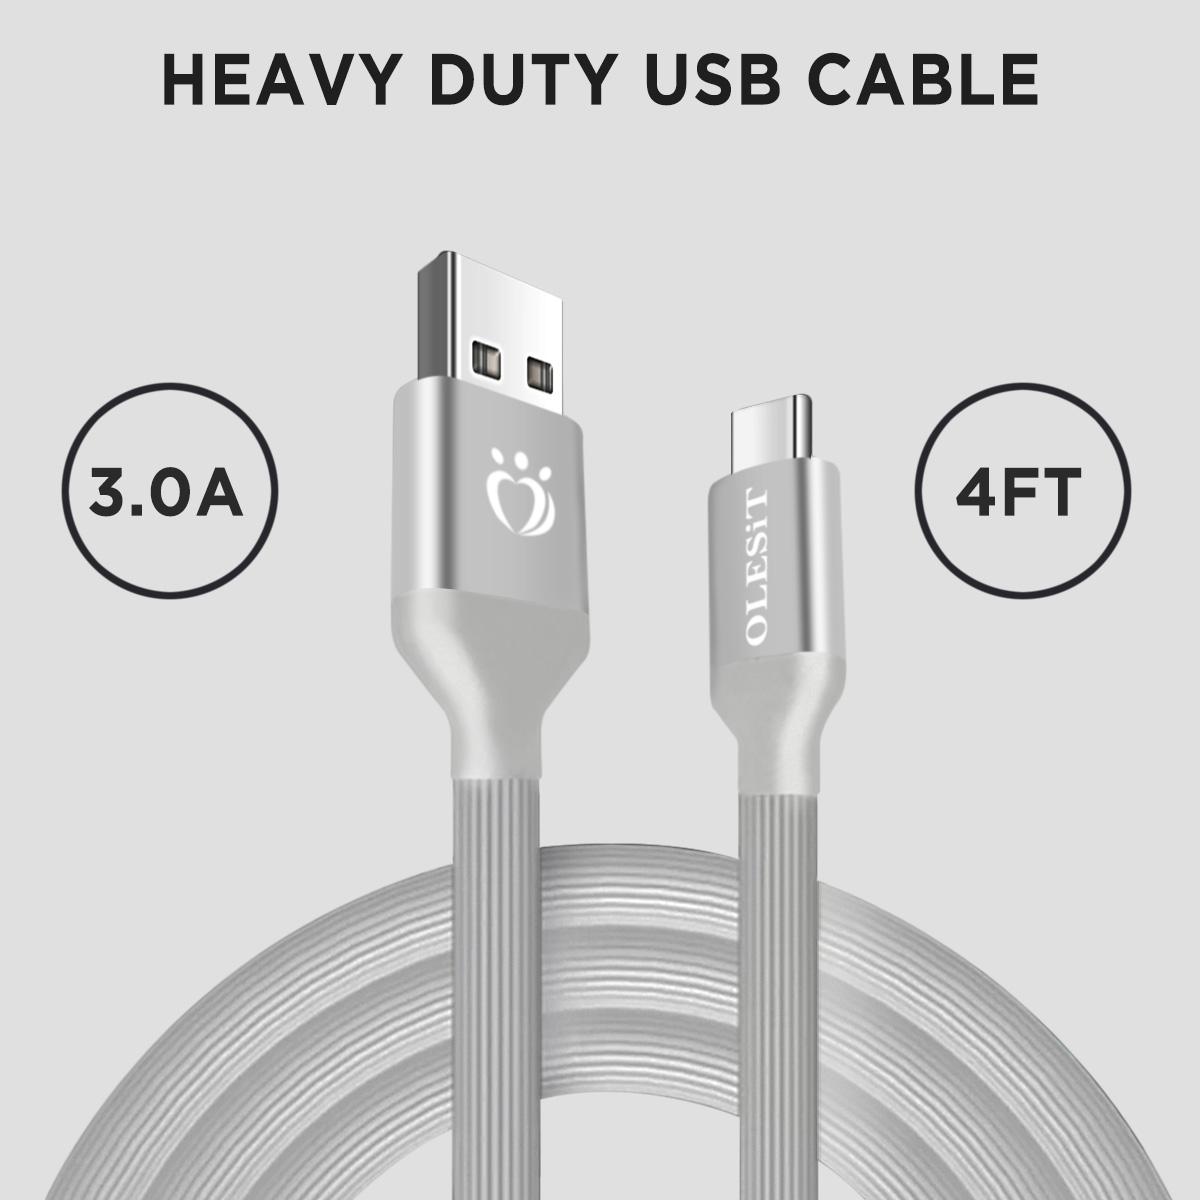 4FT-OLT-TPE-HD-USB-C-WT